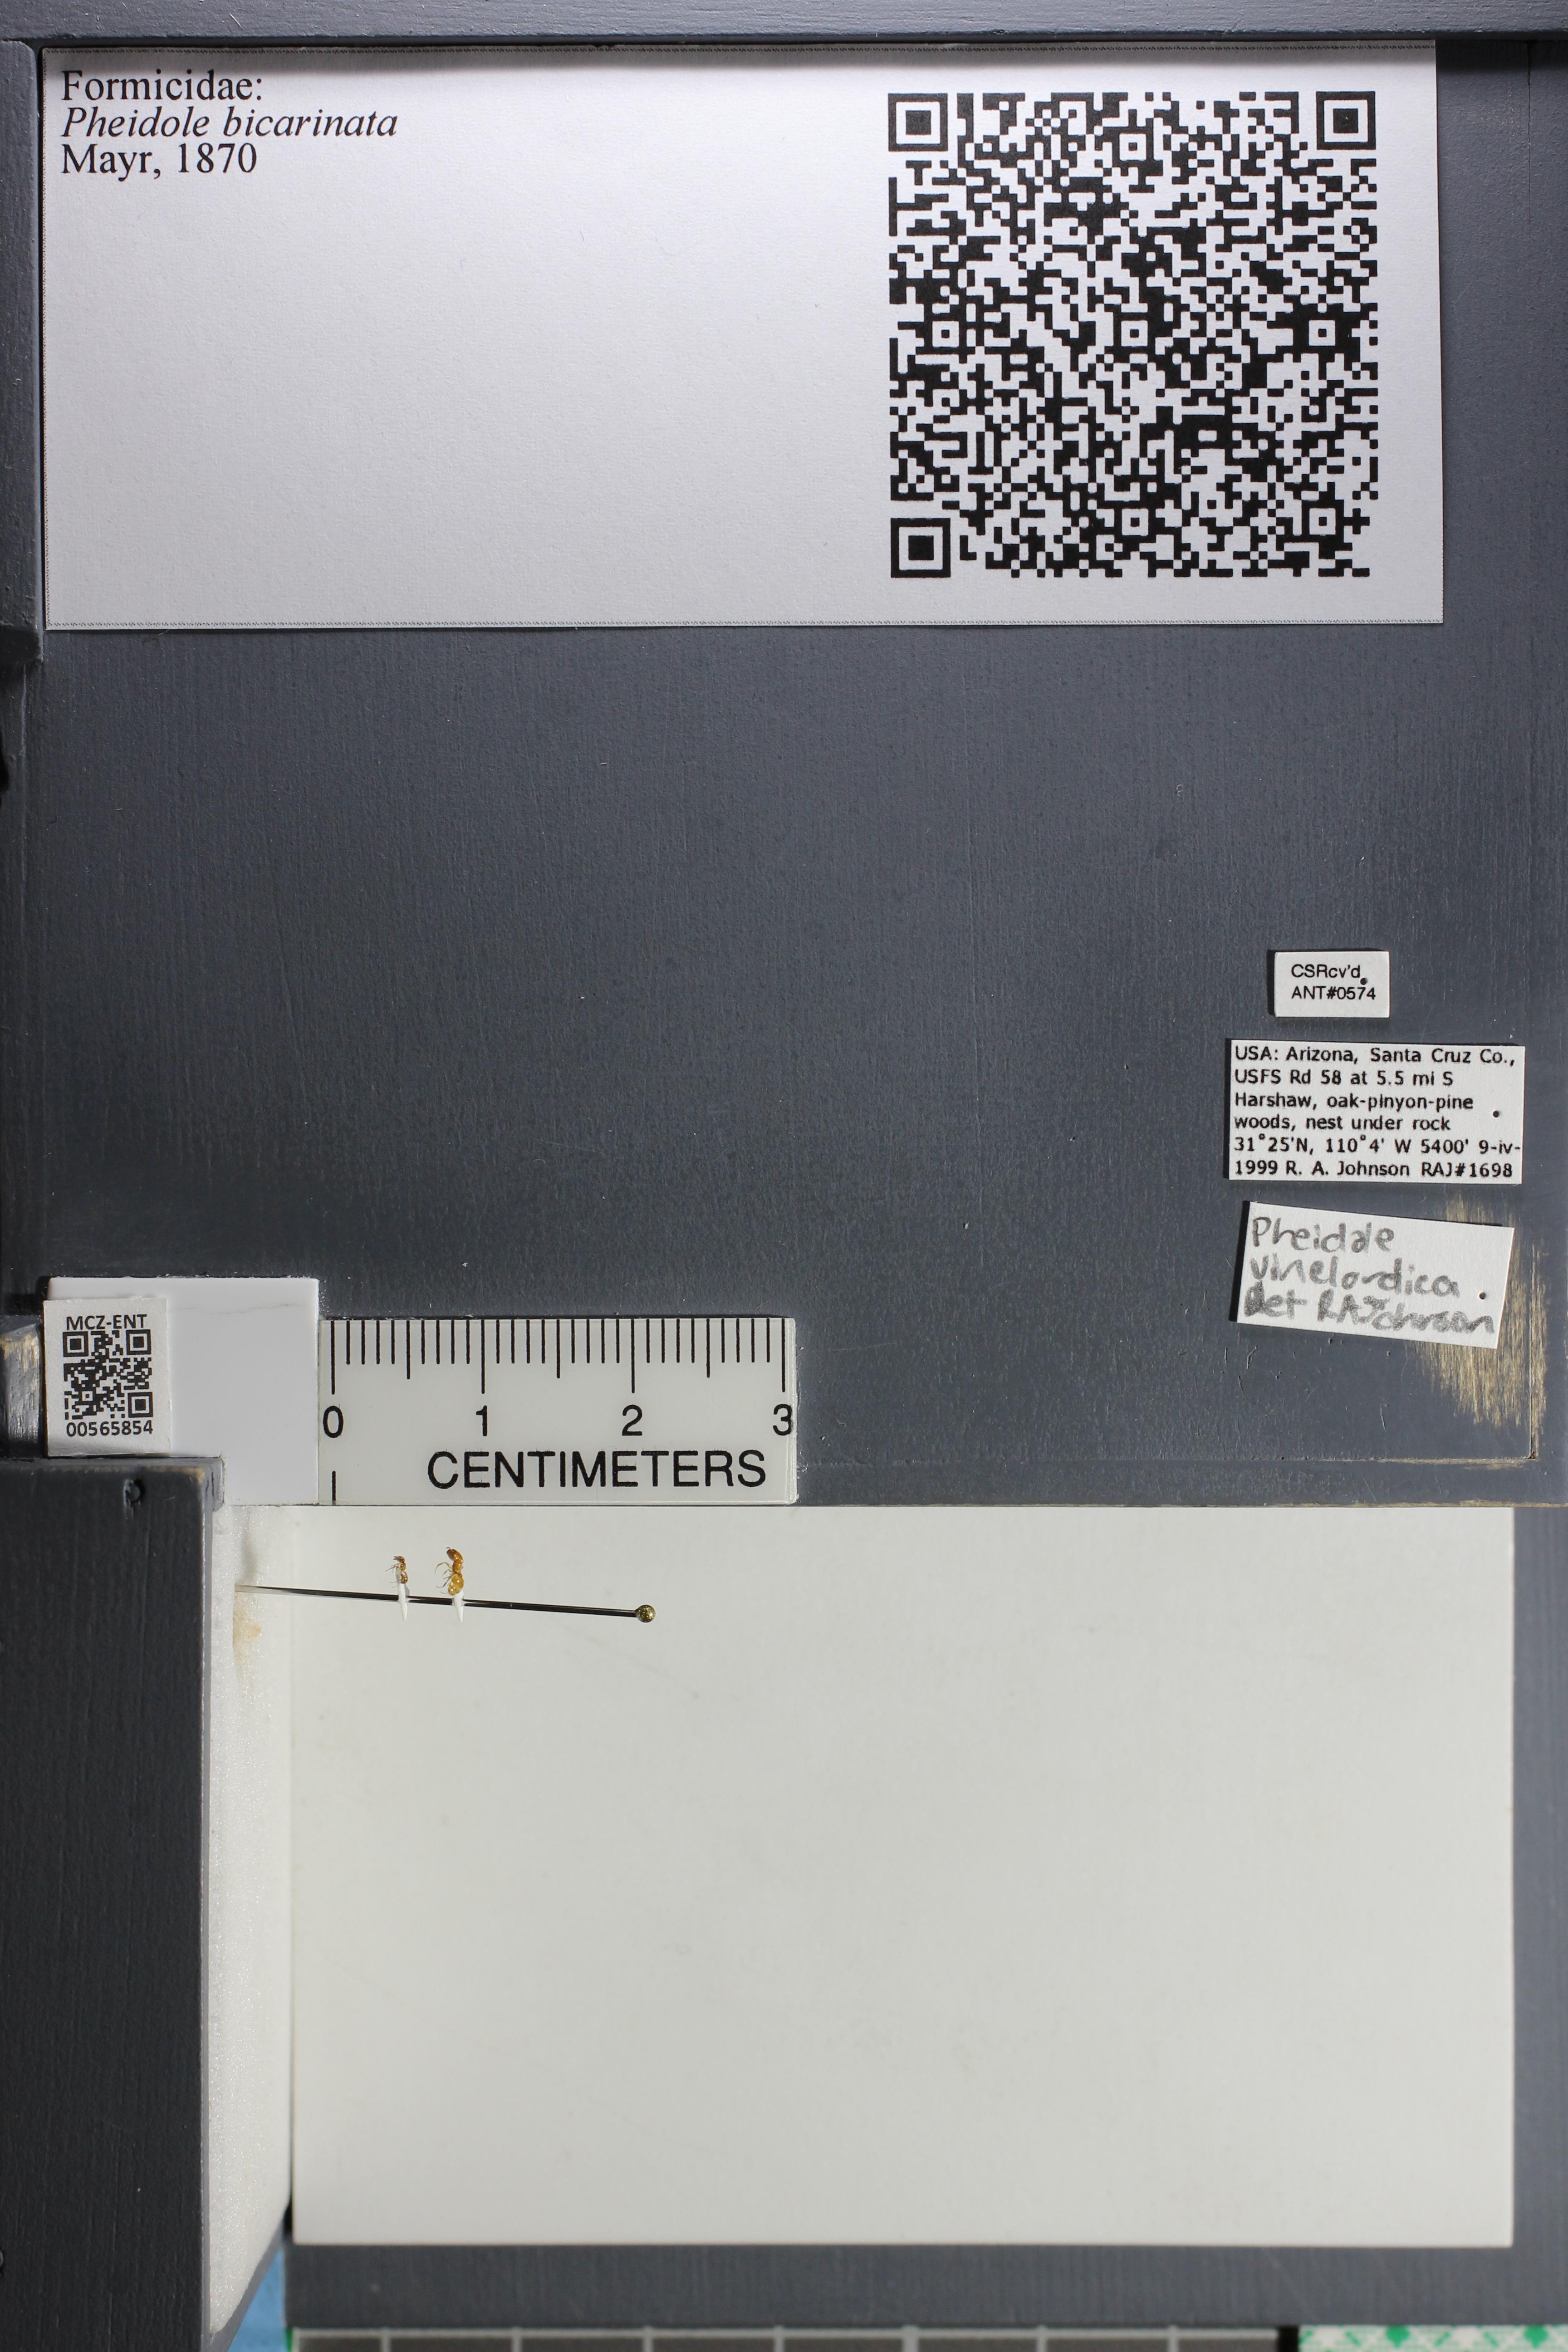 Media of type image, MCZ:Ent:565854 Identified as Pheidole bicarinata.